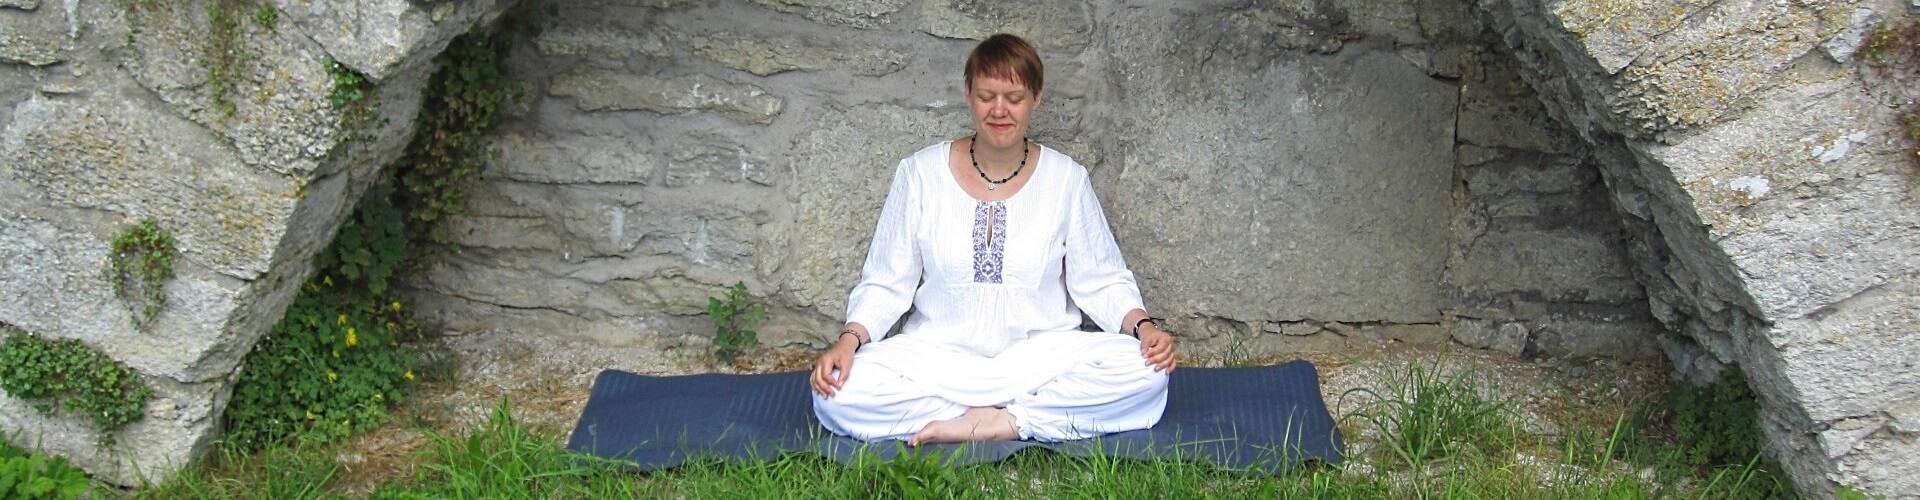 YamaYoga Catarina Lundblad